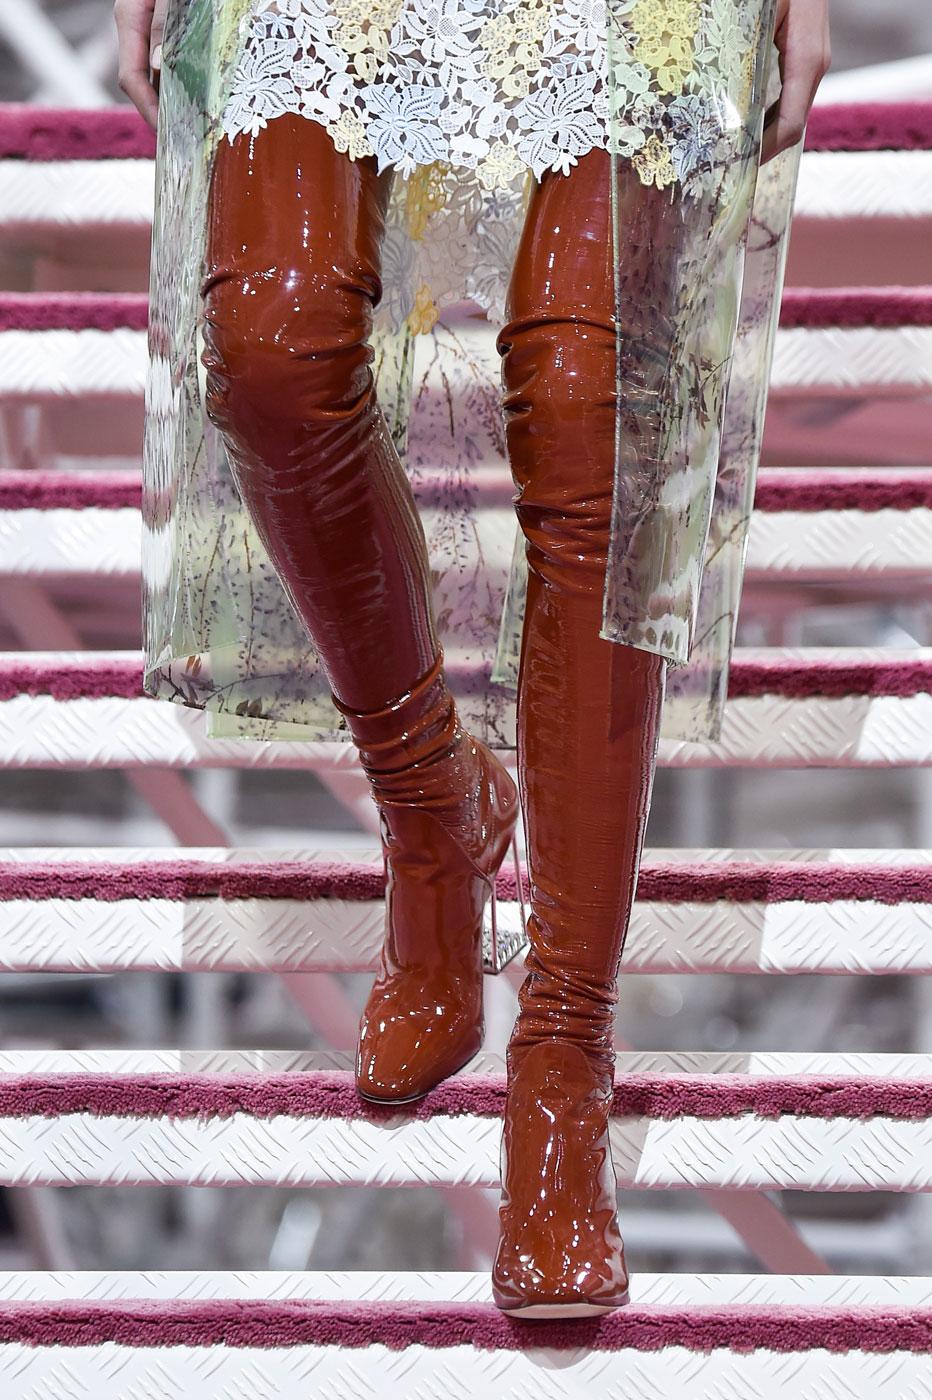 Christian-Dior-fashion-runway-show-close-ups-haute-couture-paris-spring-summer-2015-the-impression-002